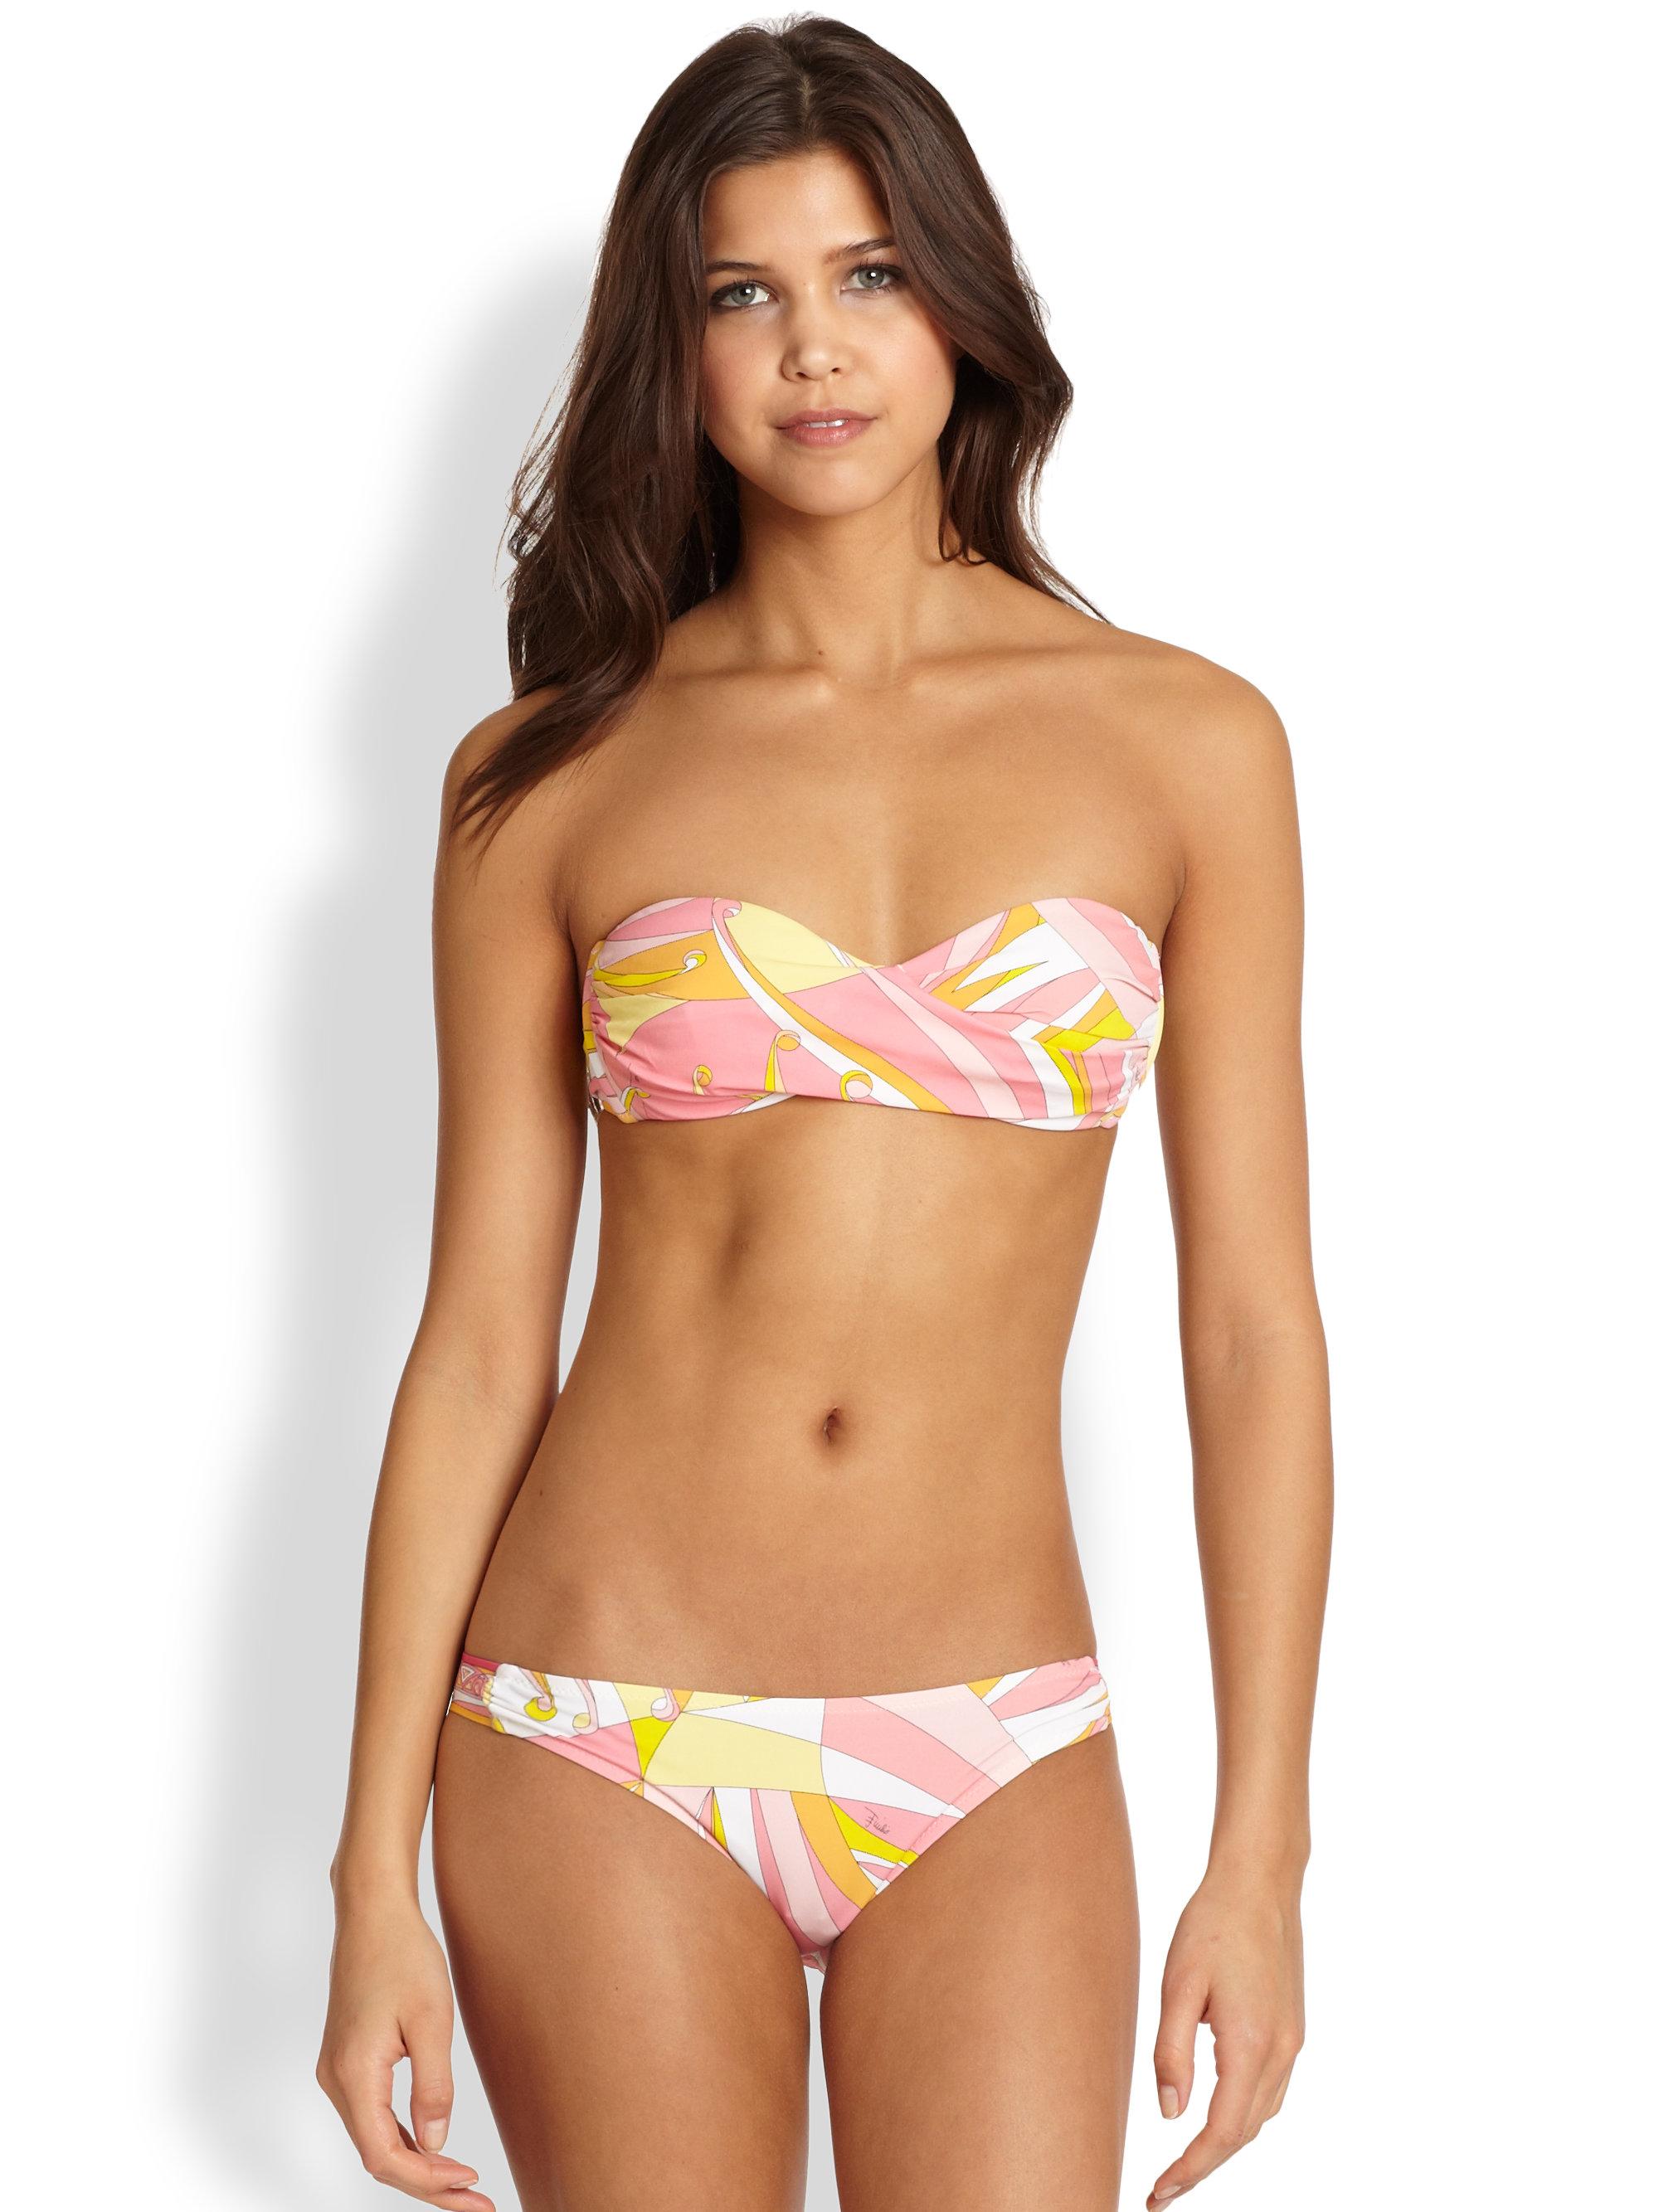 Emilio Pucci Twopiece Bandeau Bikini in Pink